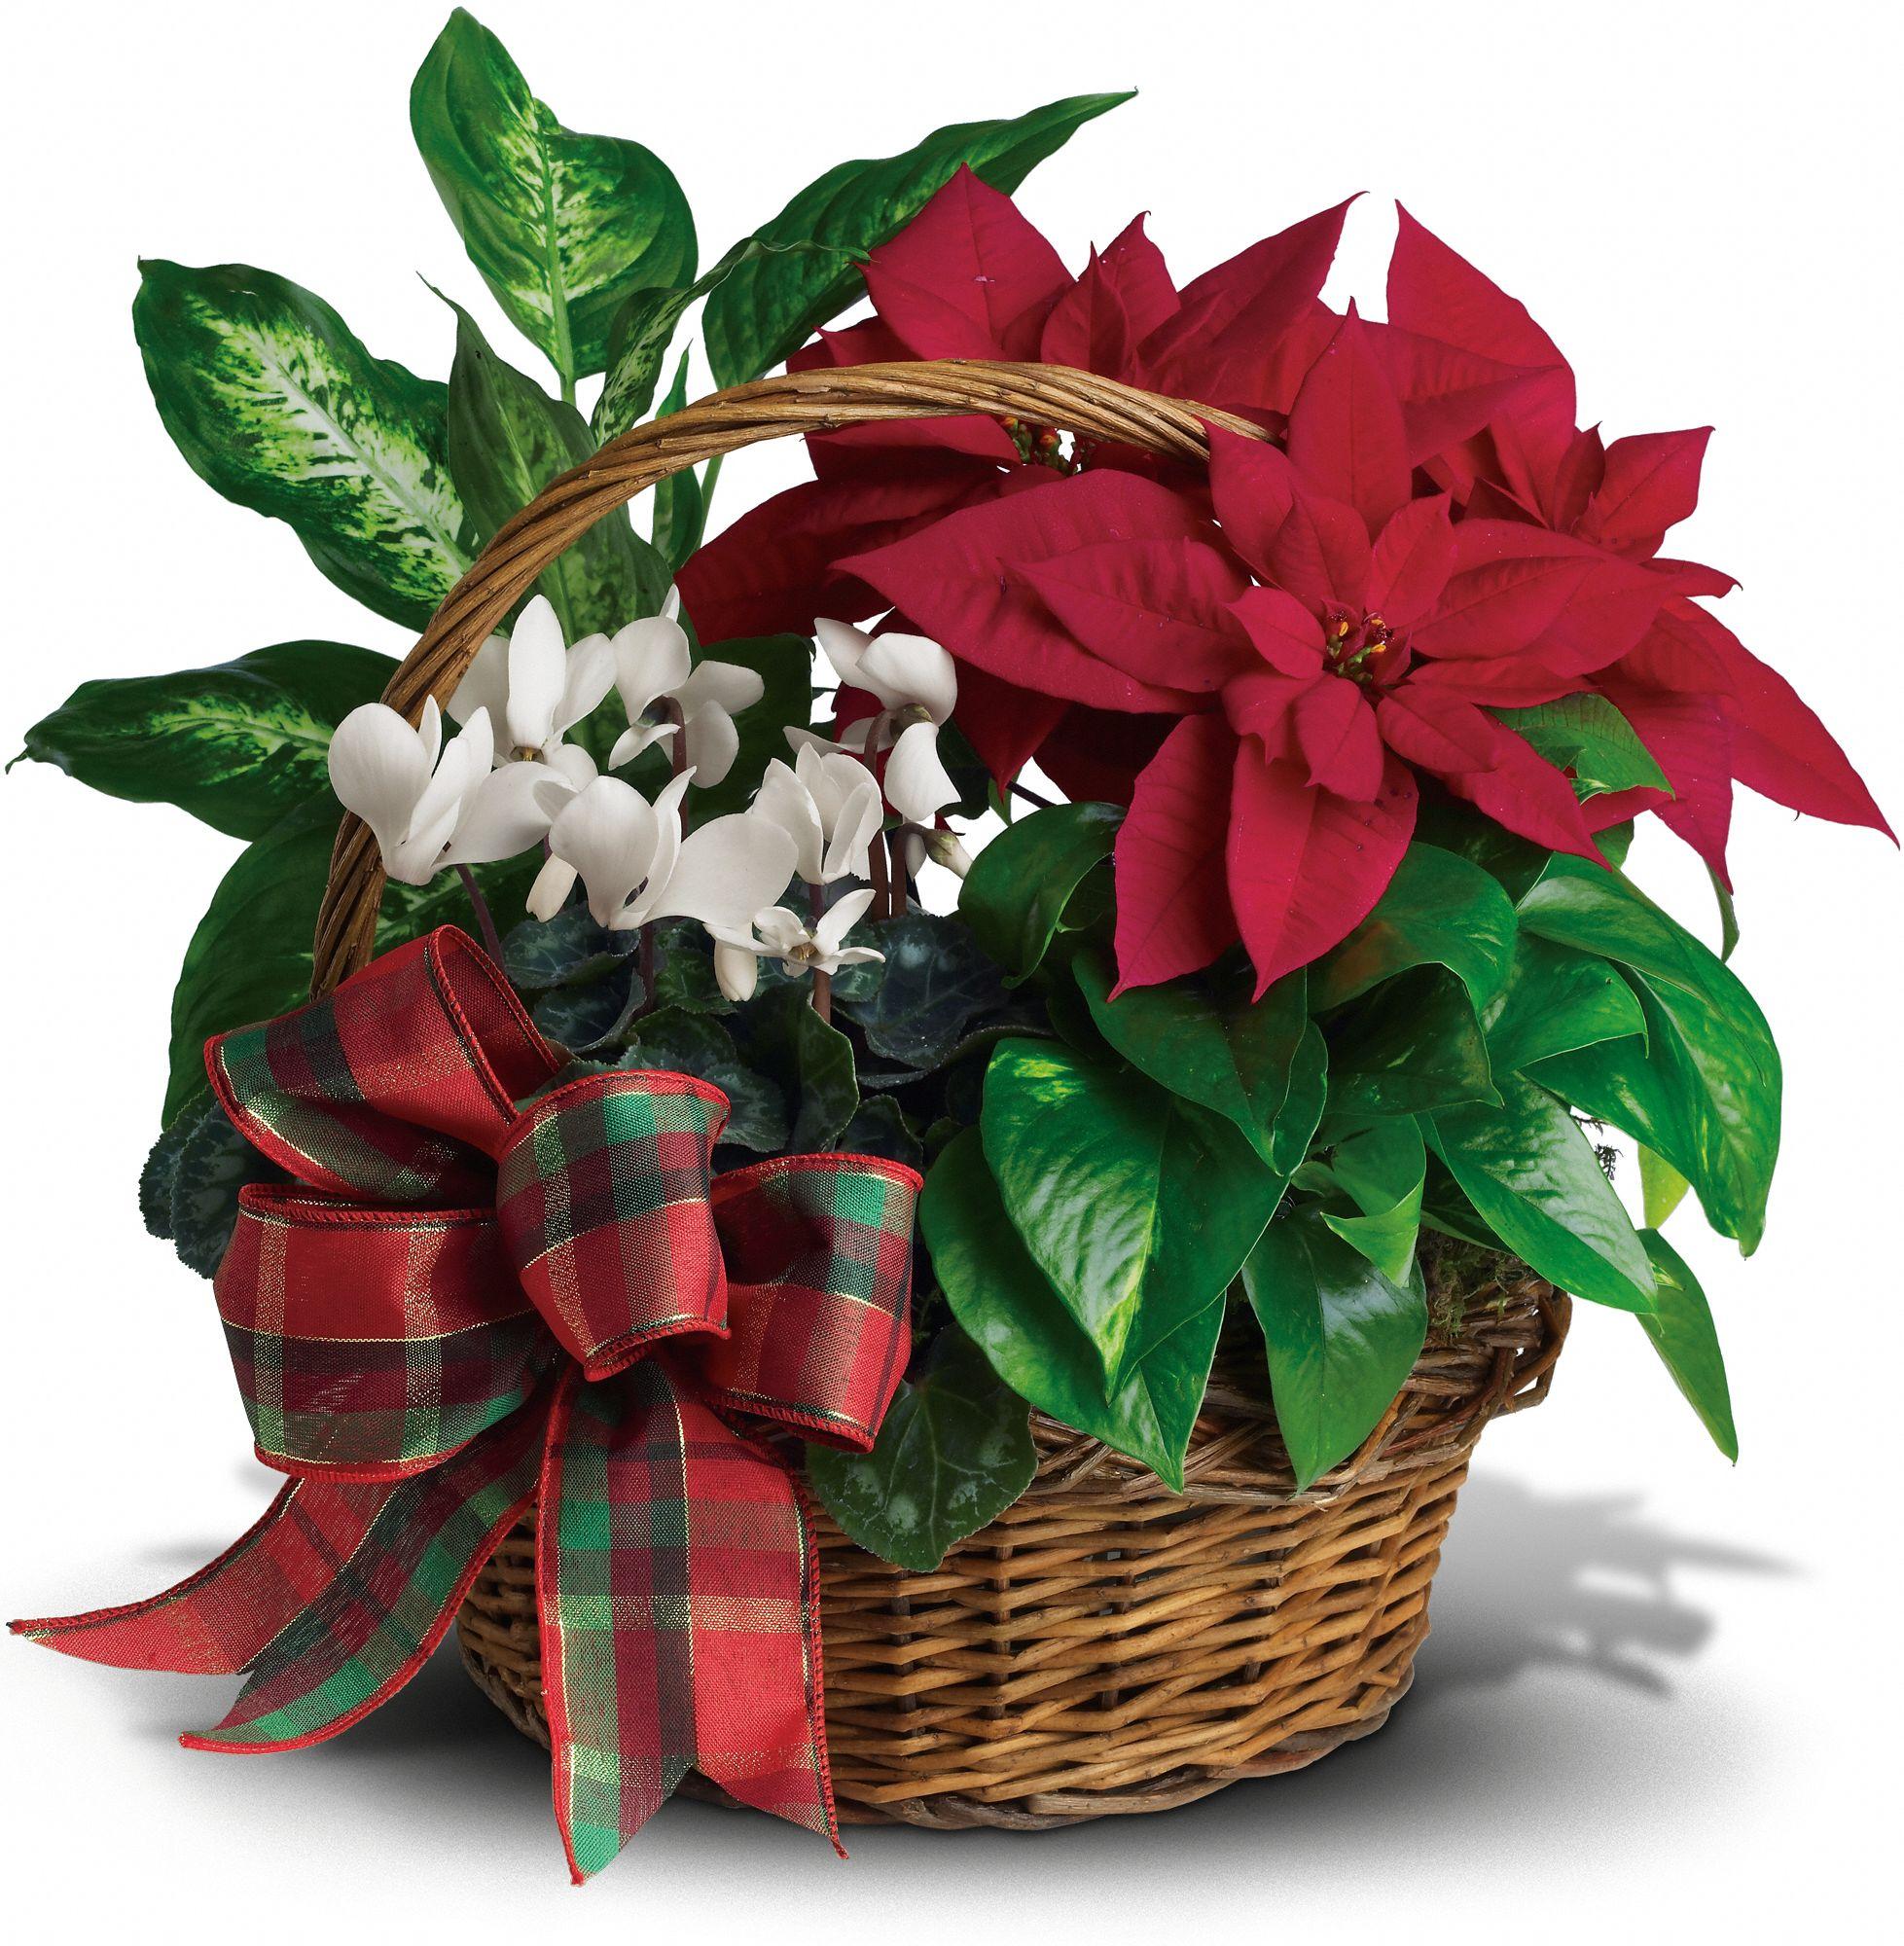 Holiday Homecoming Basket of Plants